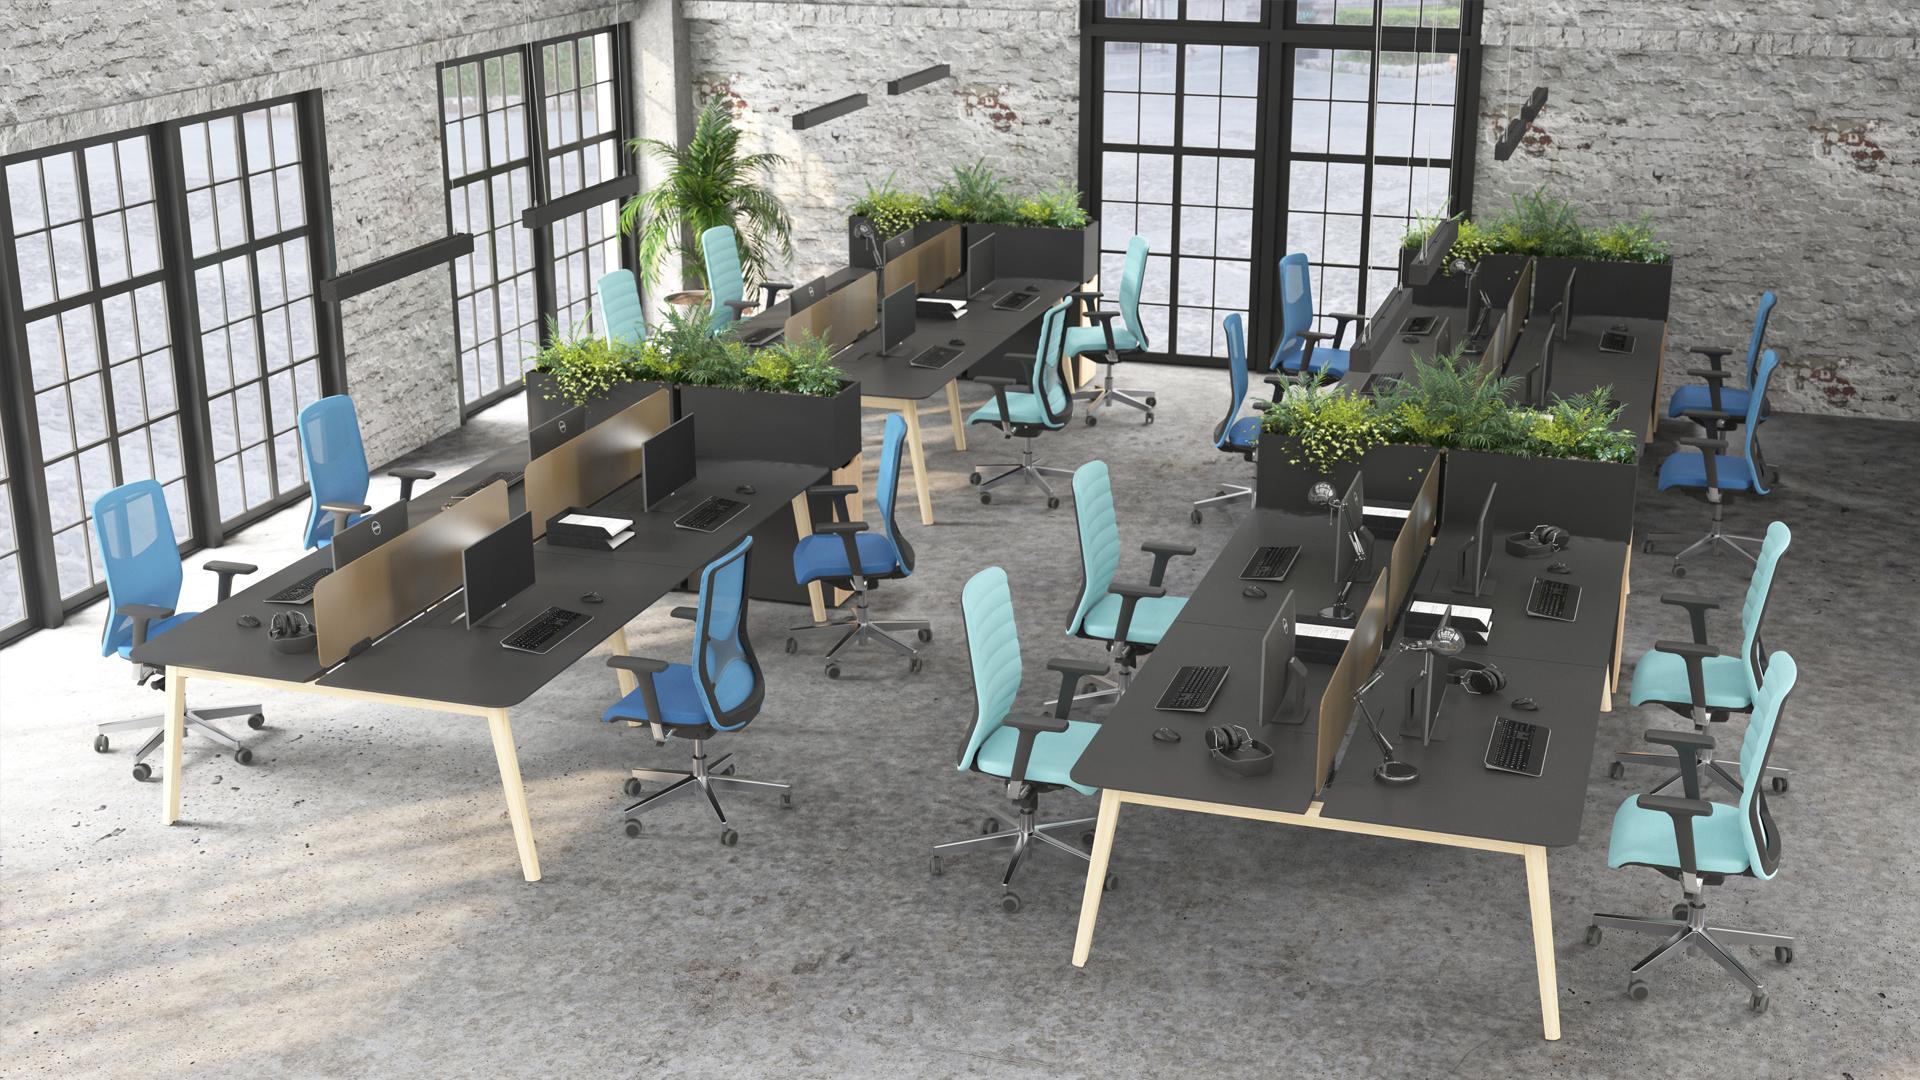 WIND biroja krēsls ar silikonaa muguras balstu pie NOVA Wood galda